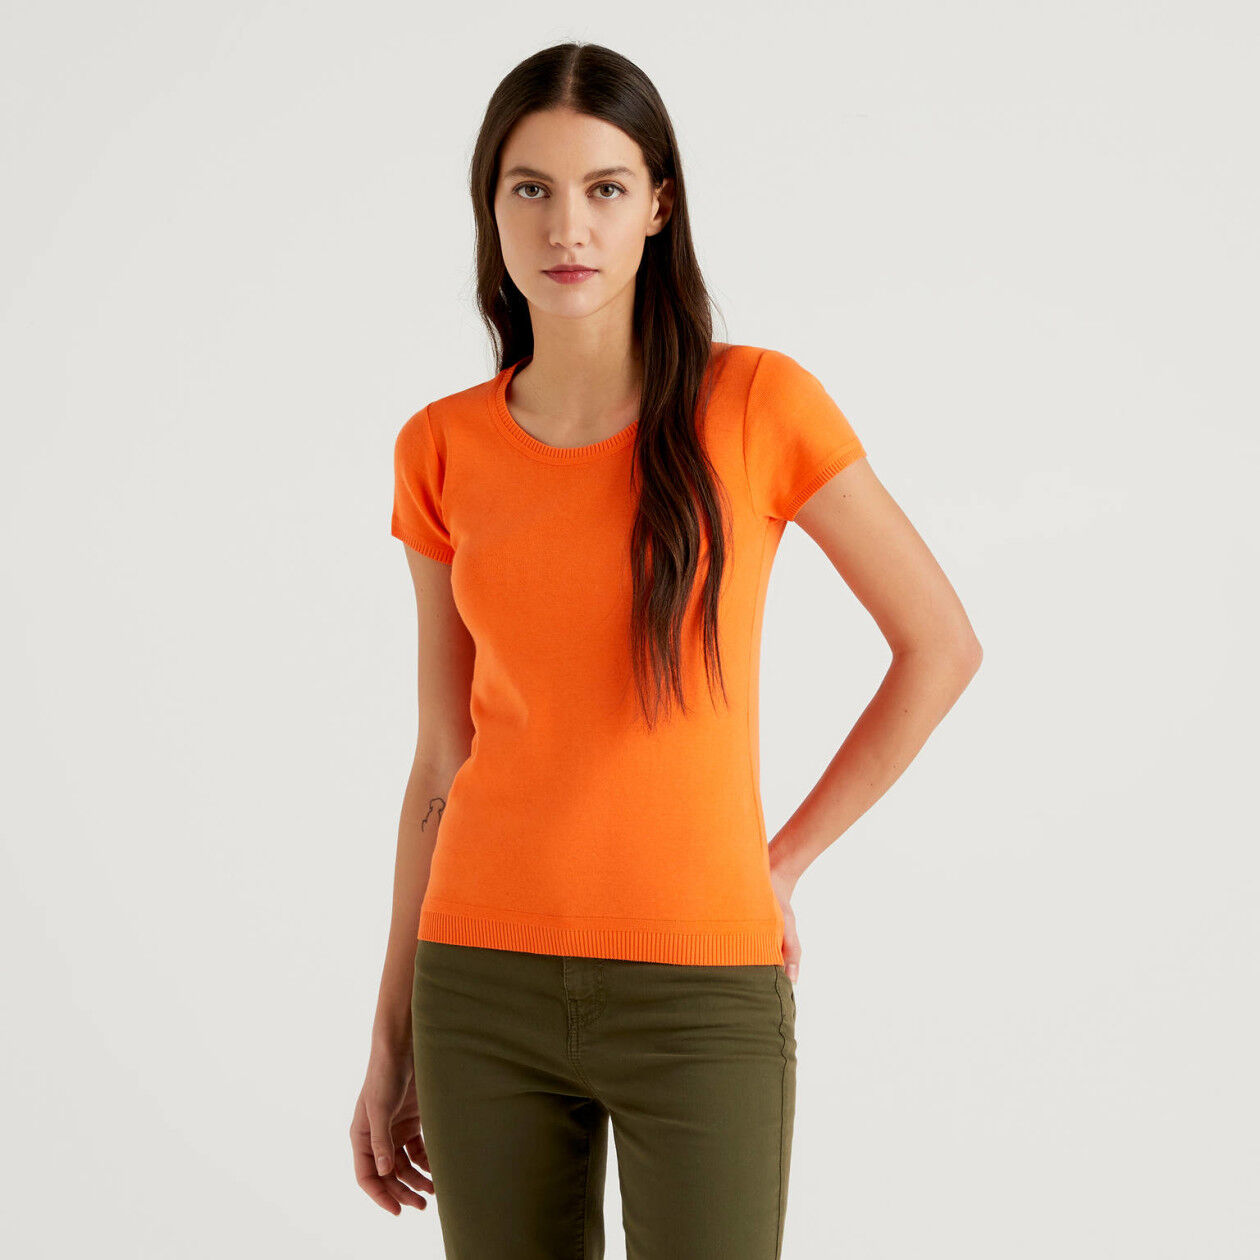 Jersey de manga corta de algodón